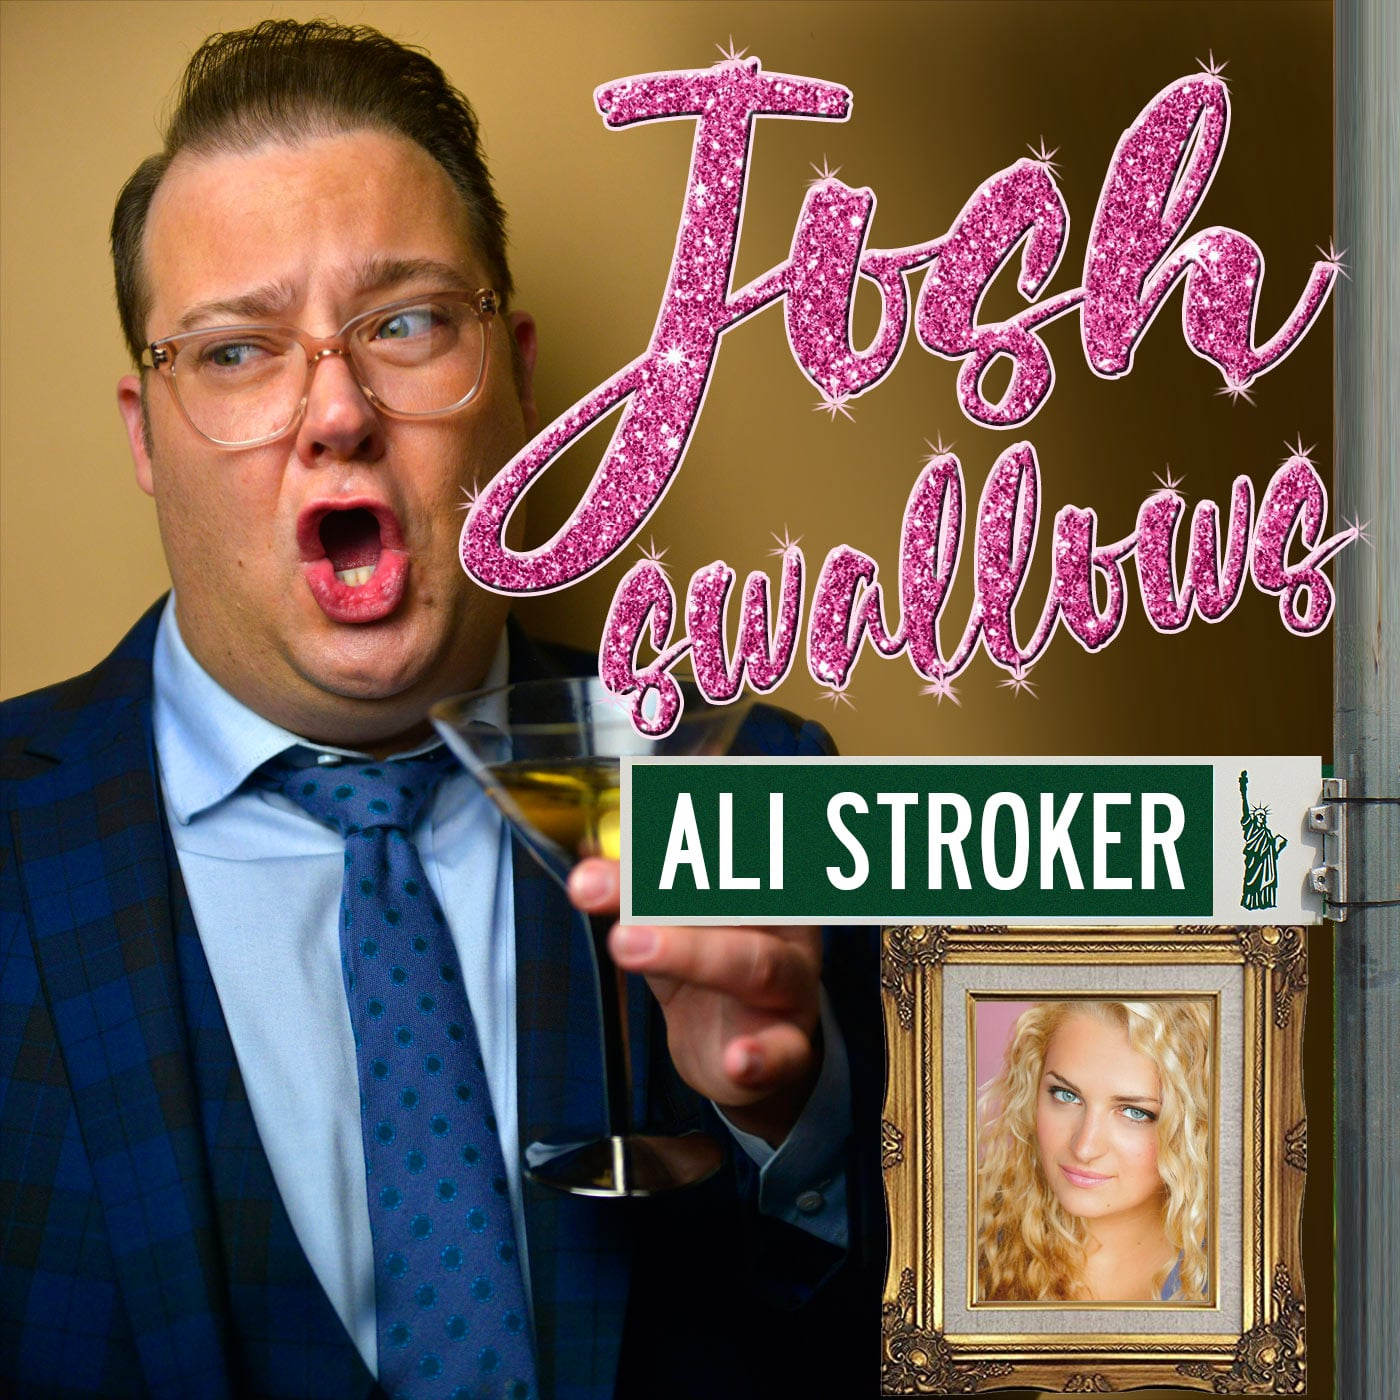 Josh Swallows Broadway Episode 17 Ali Stoker